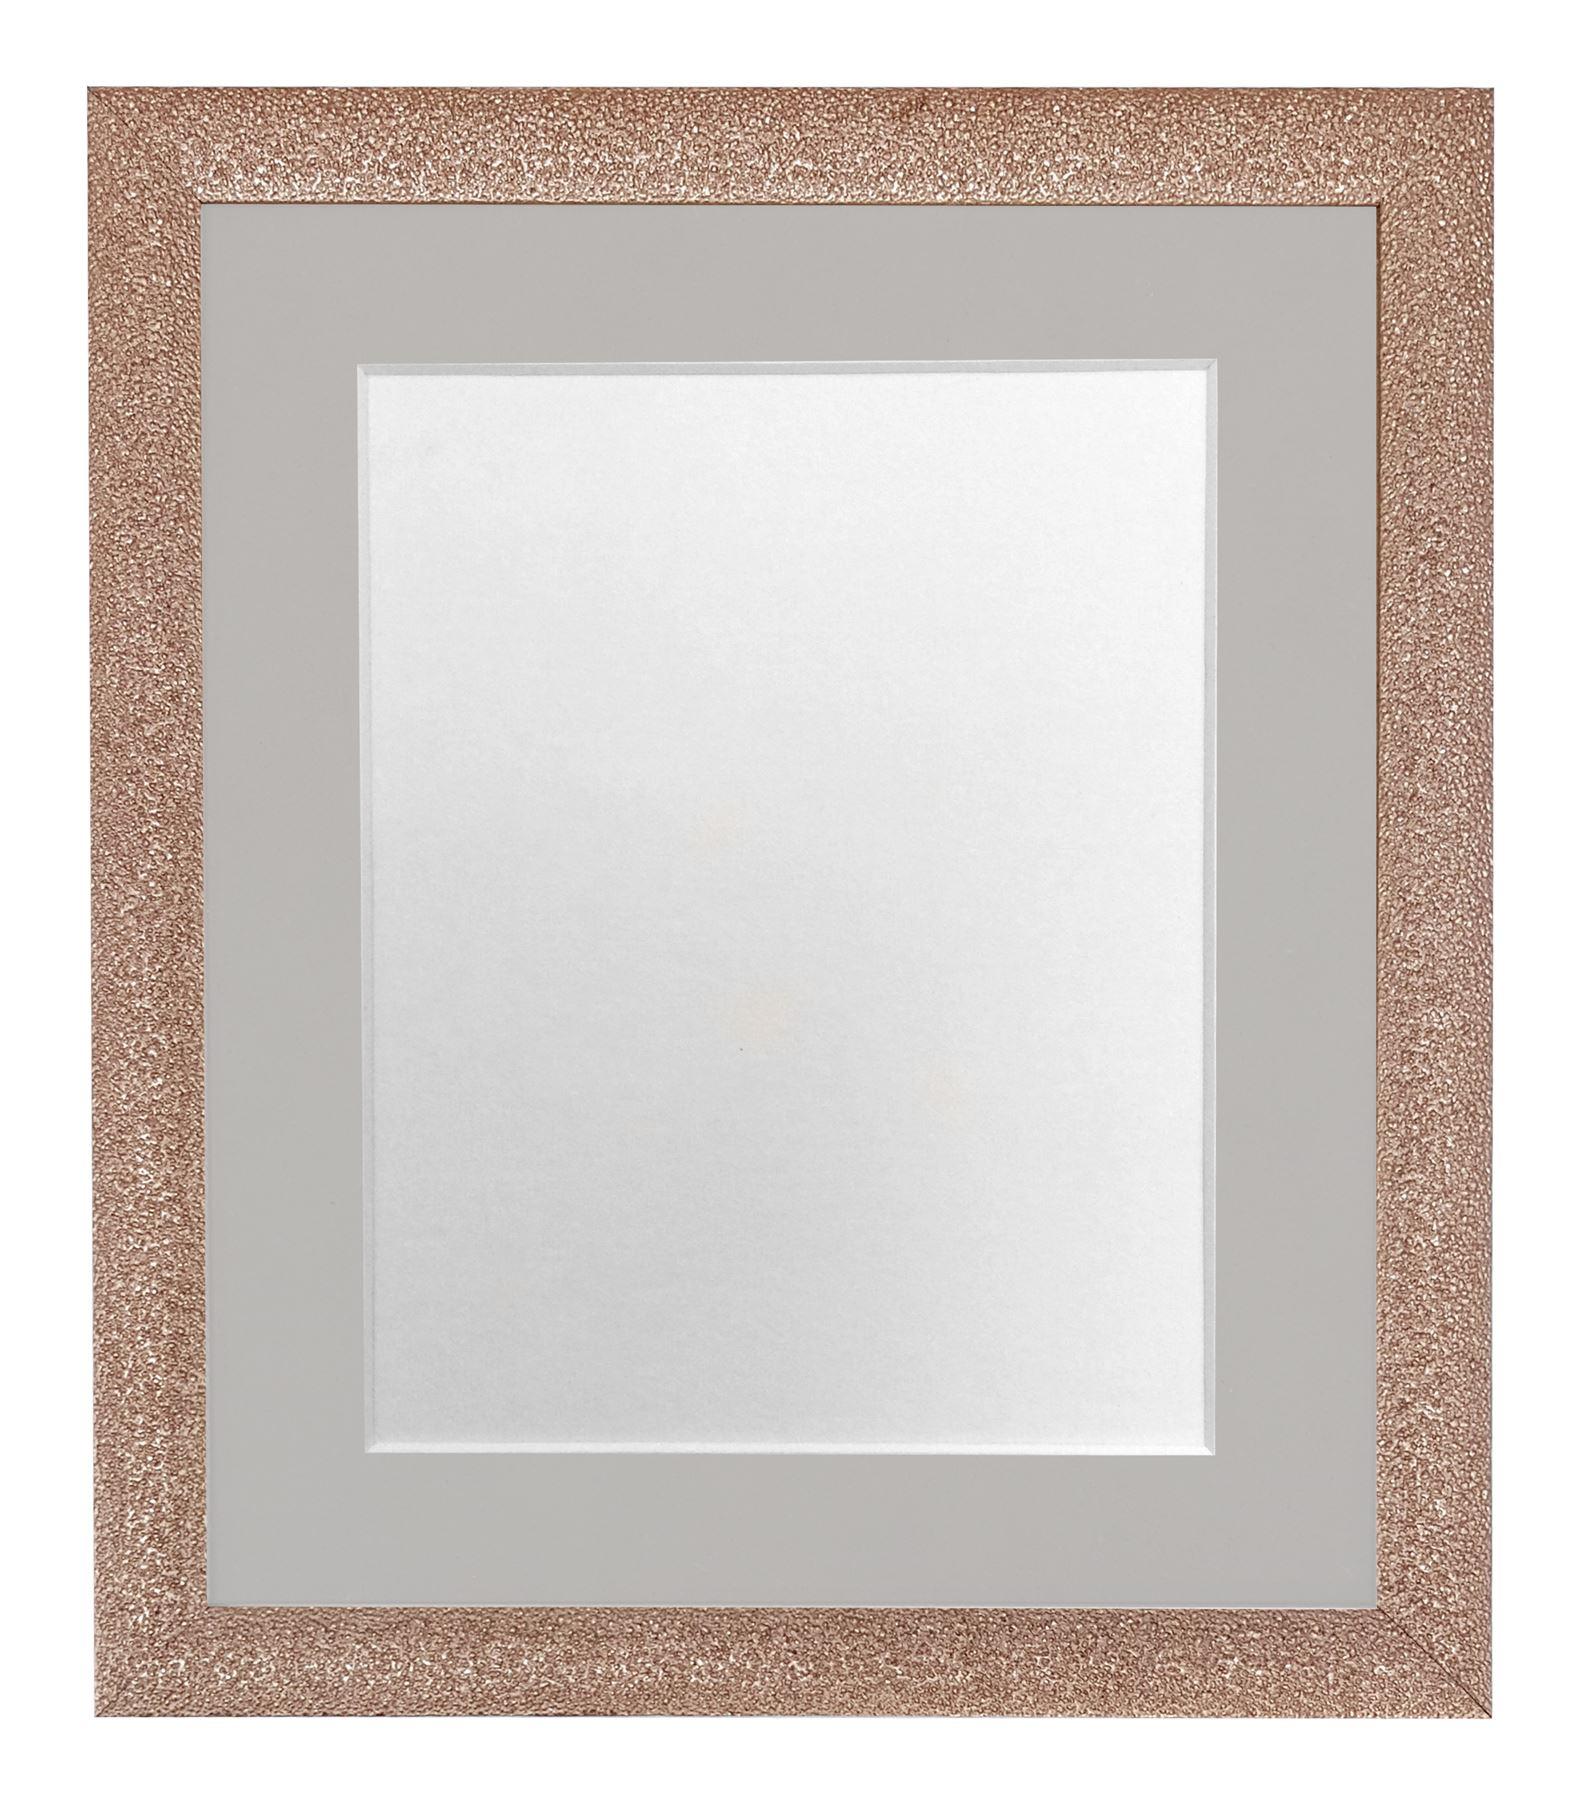 Glitz rose gold picture photo frames with white black and for Cornici amazon